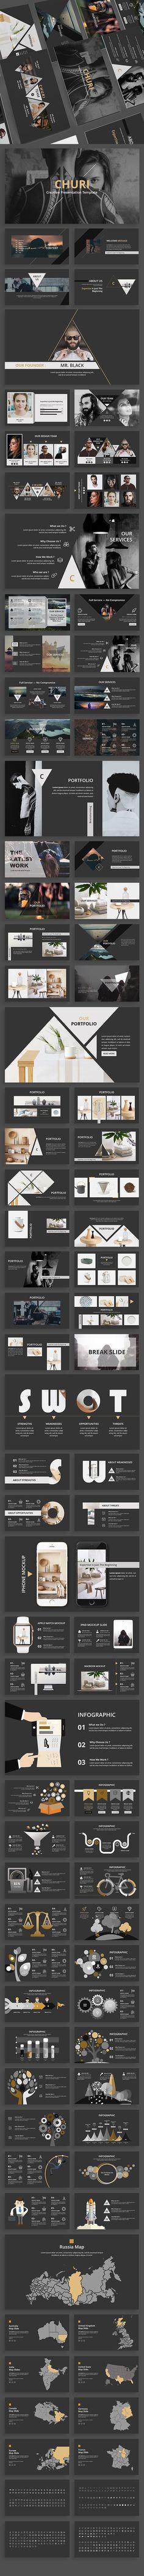 Churi Creative Powerpoint Template - Creative PowerPoint Templates